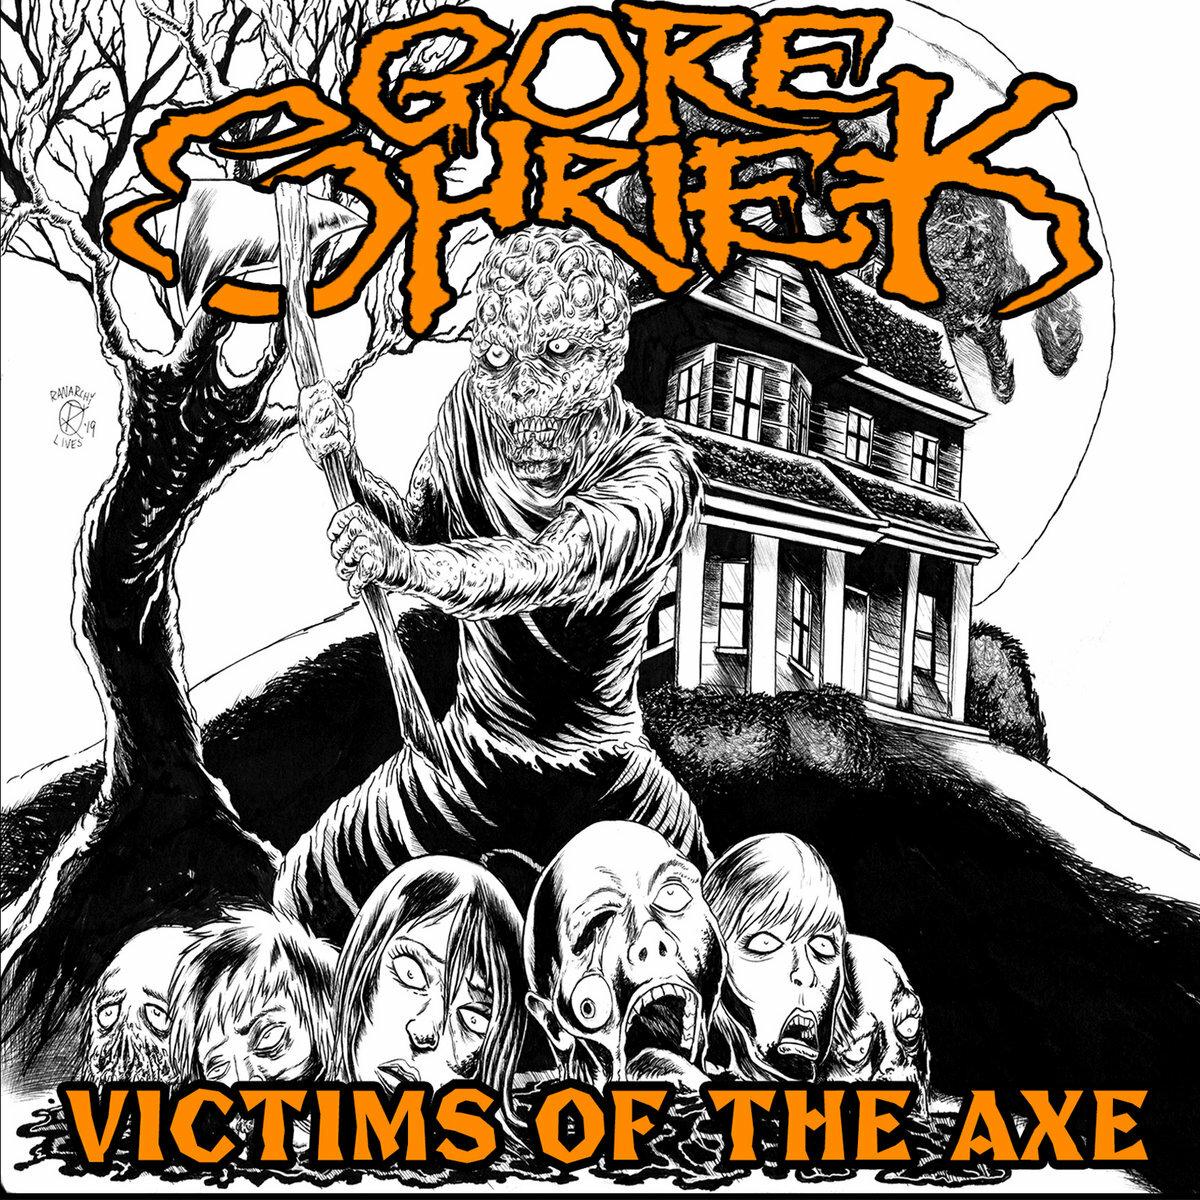 Gore Shriek - Victims of the Axe